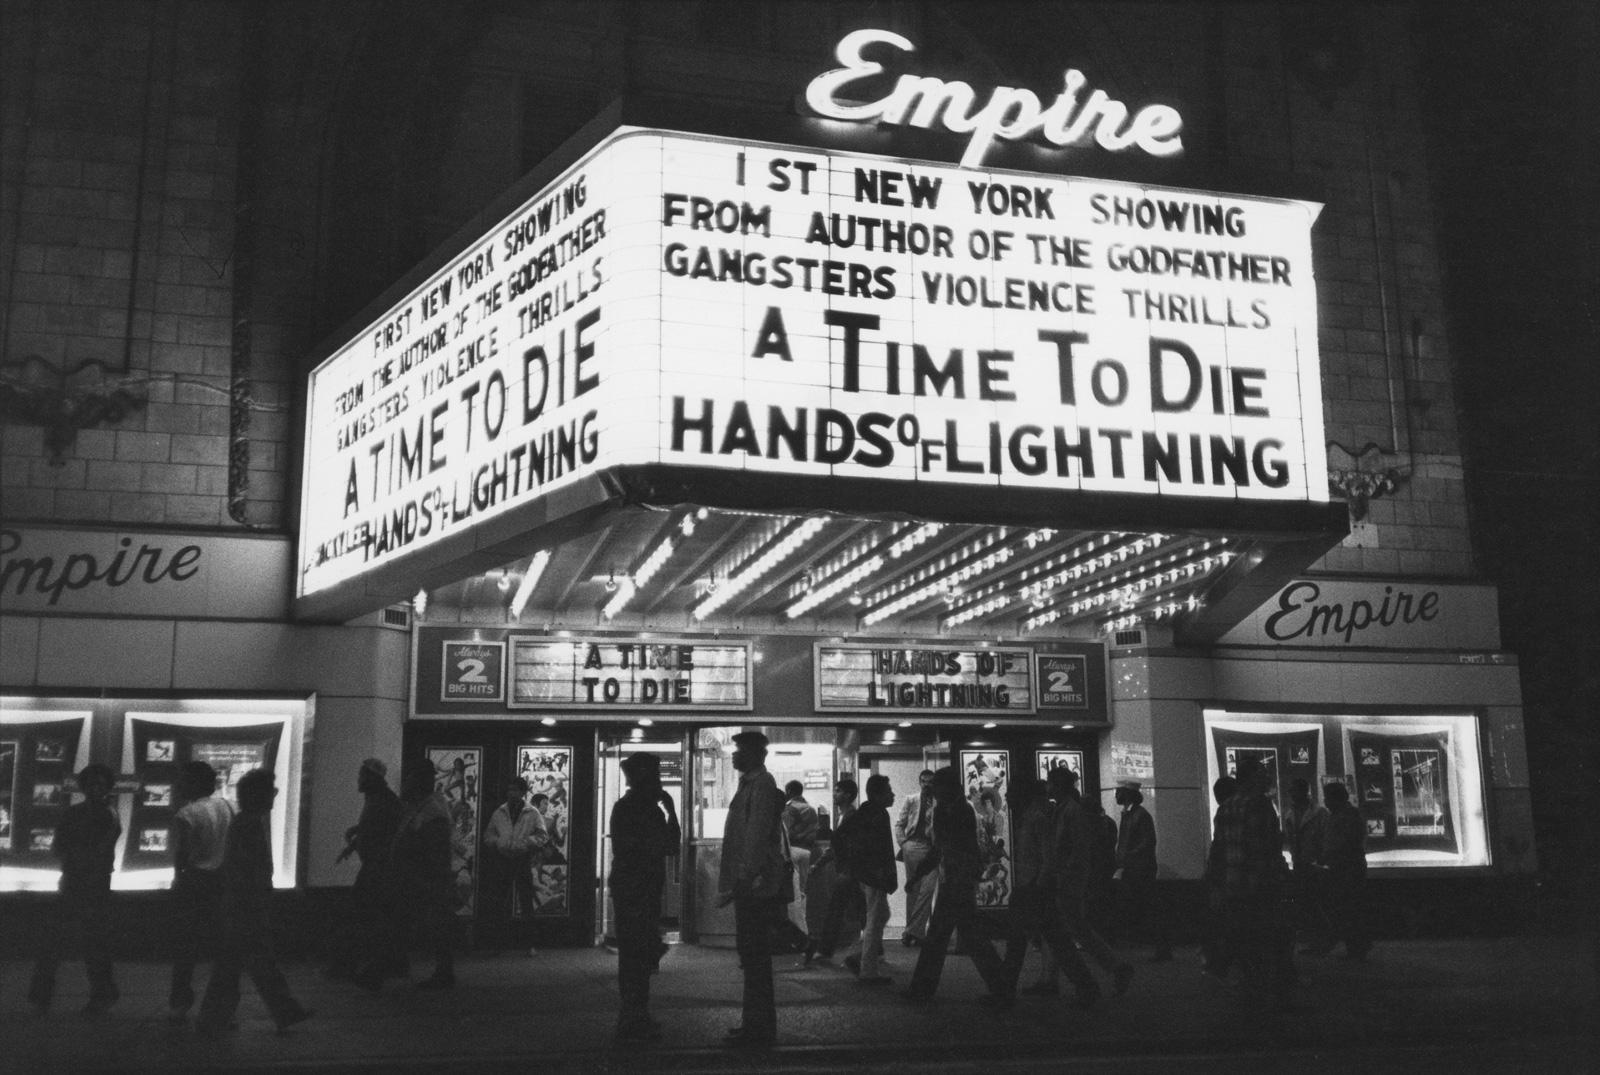 Empire cinema, New York City, 1983